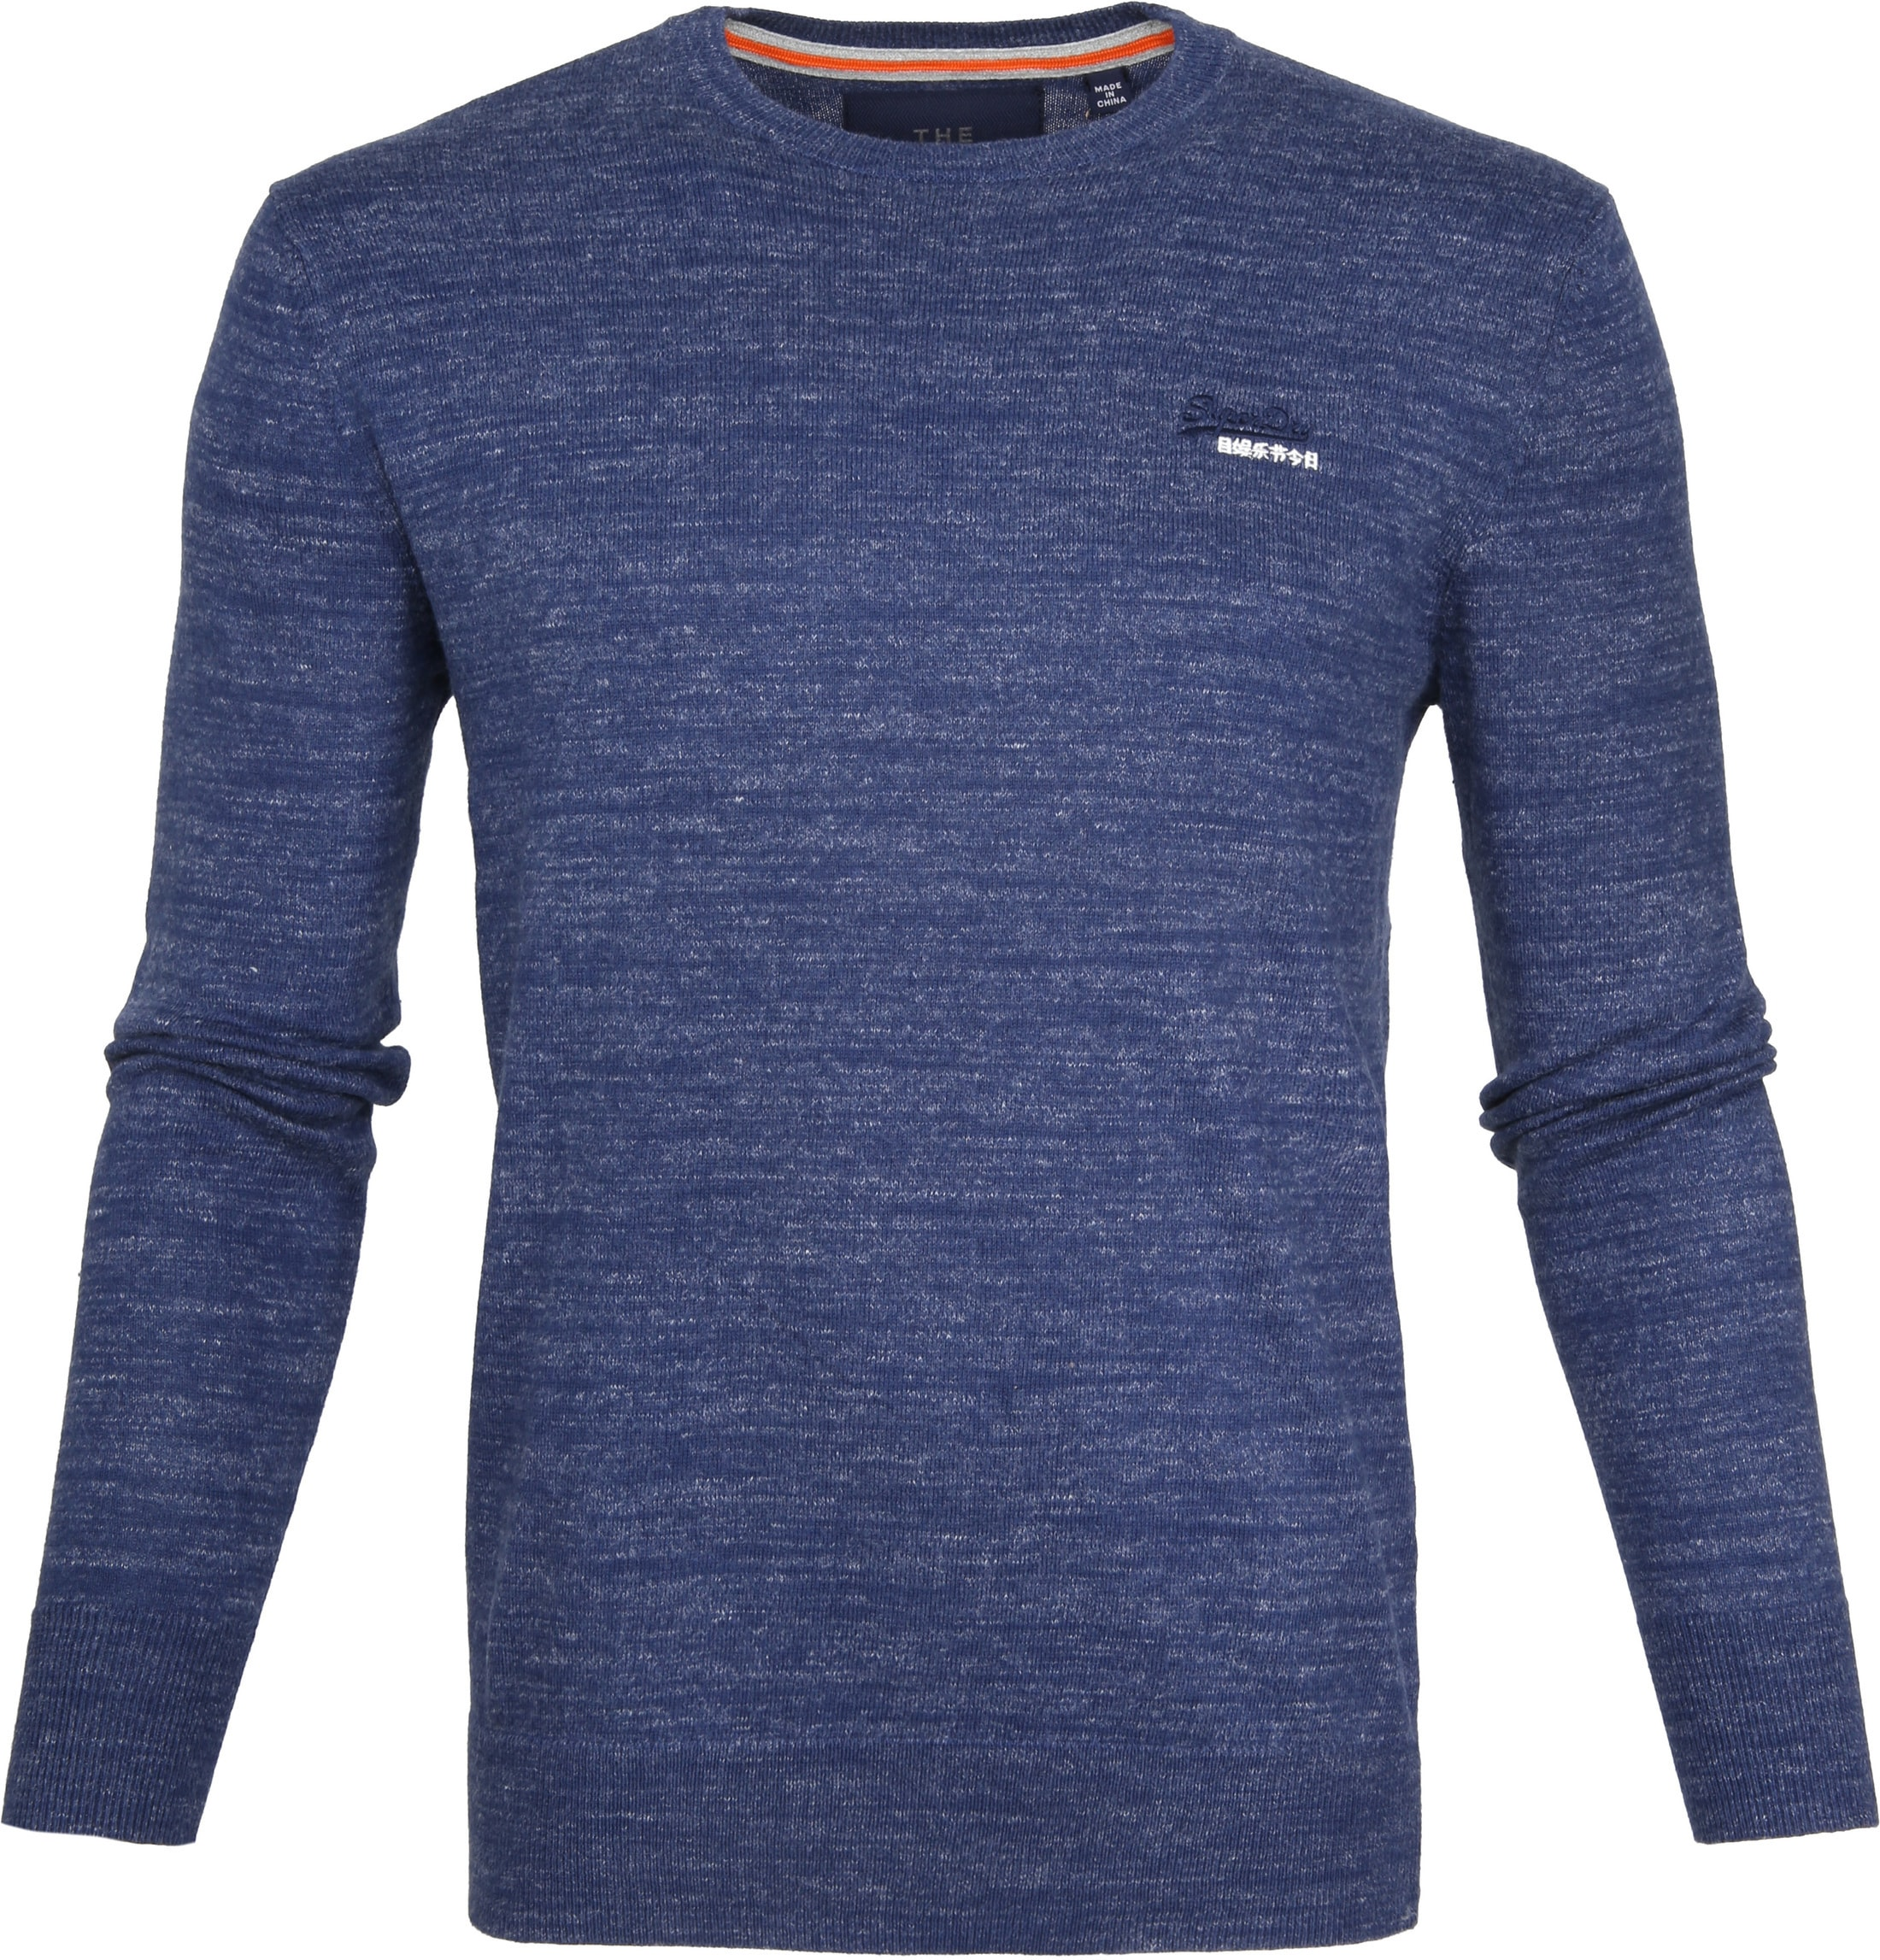 Superdry Pullover Melange Blauw foto 0